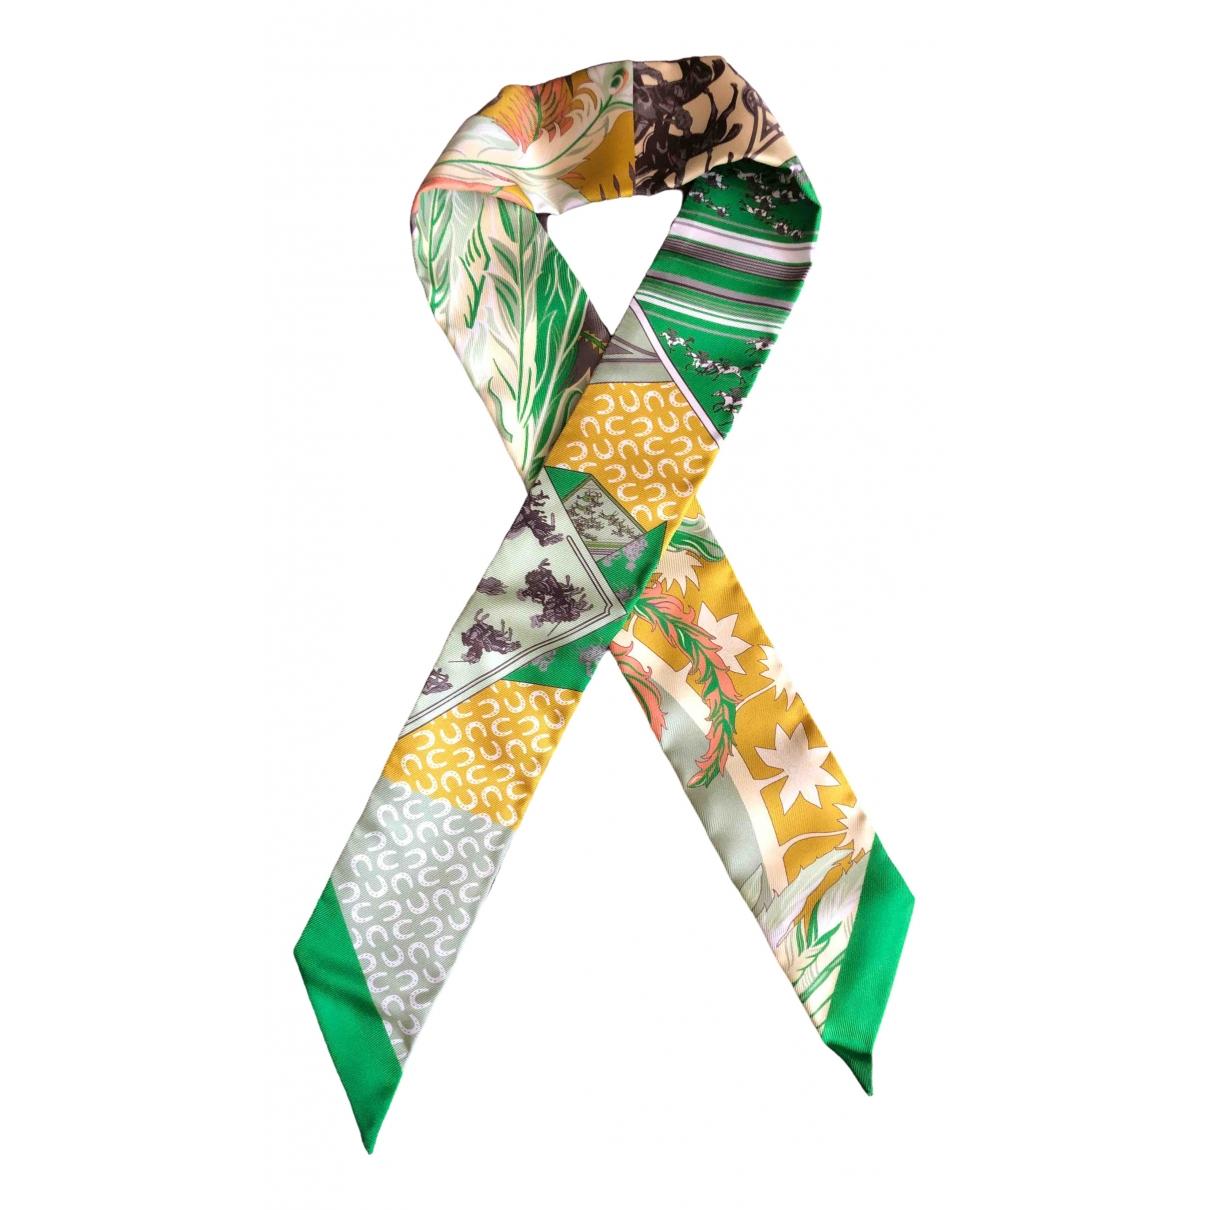 Hermes - Foulard Twilly 86 pour femme en soie - vert